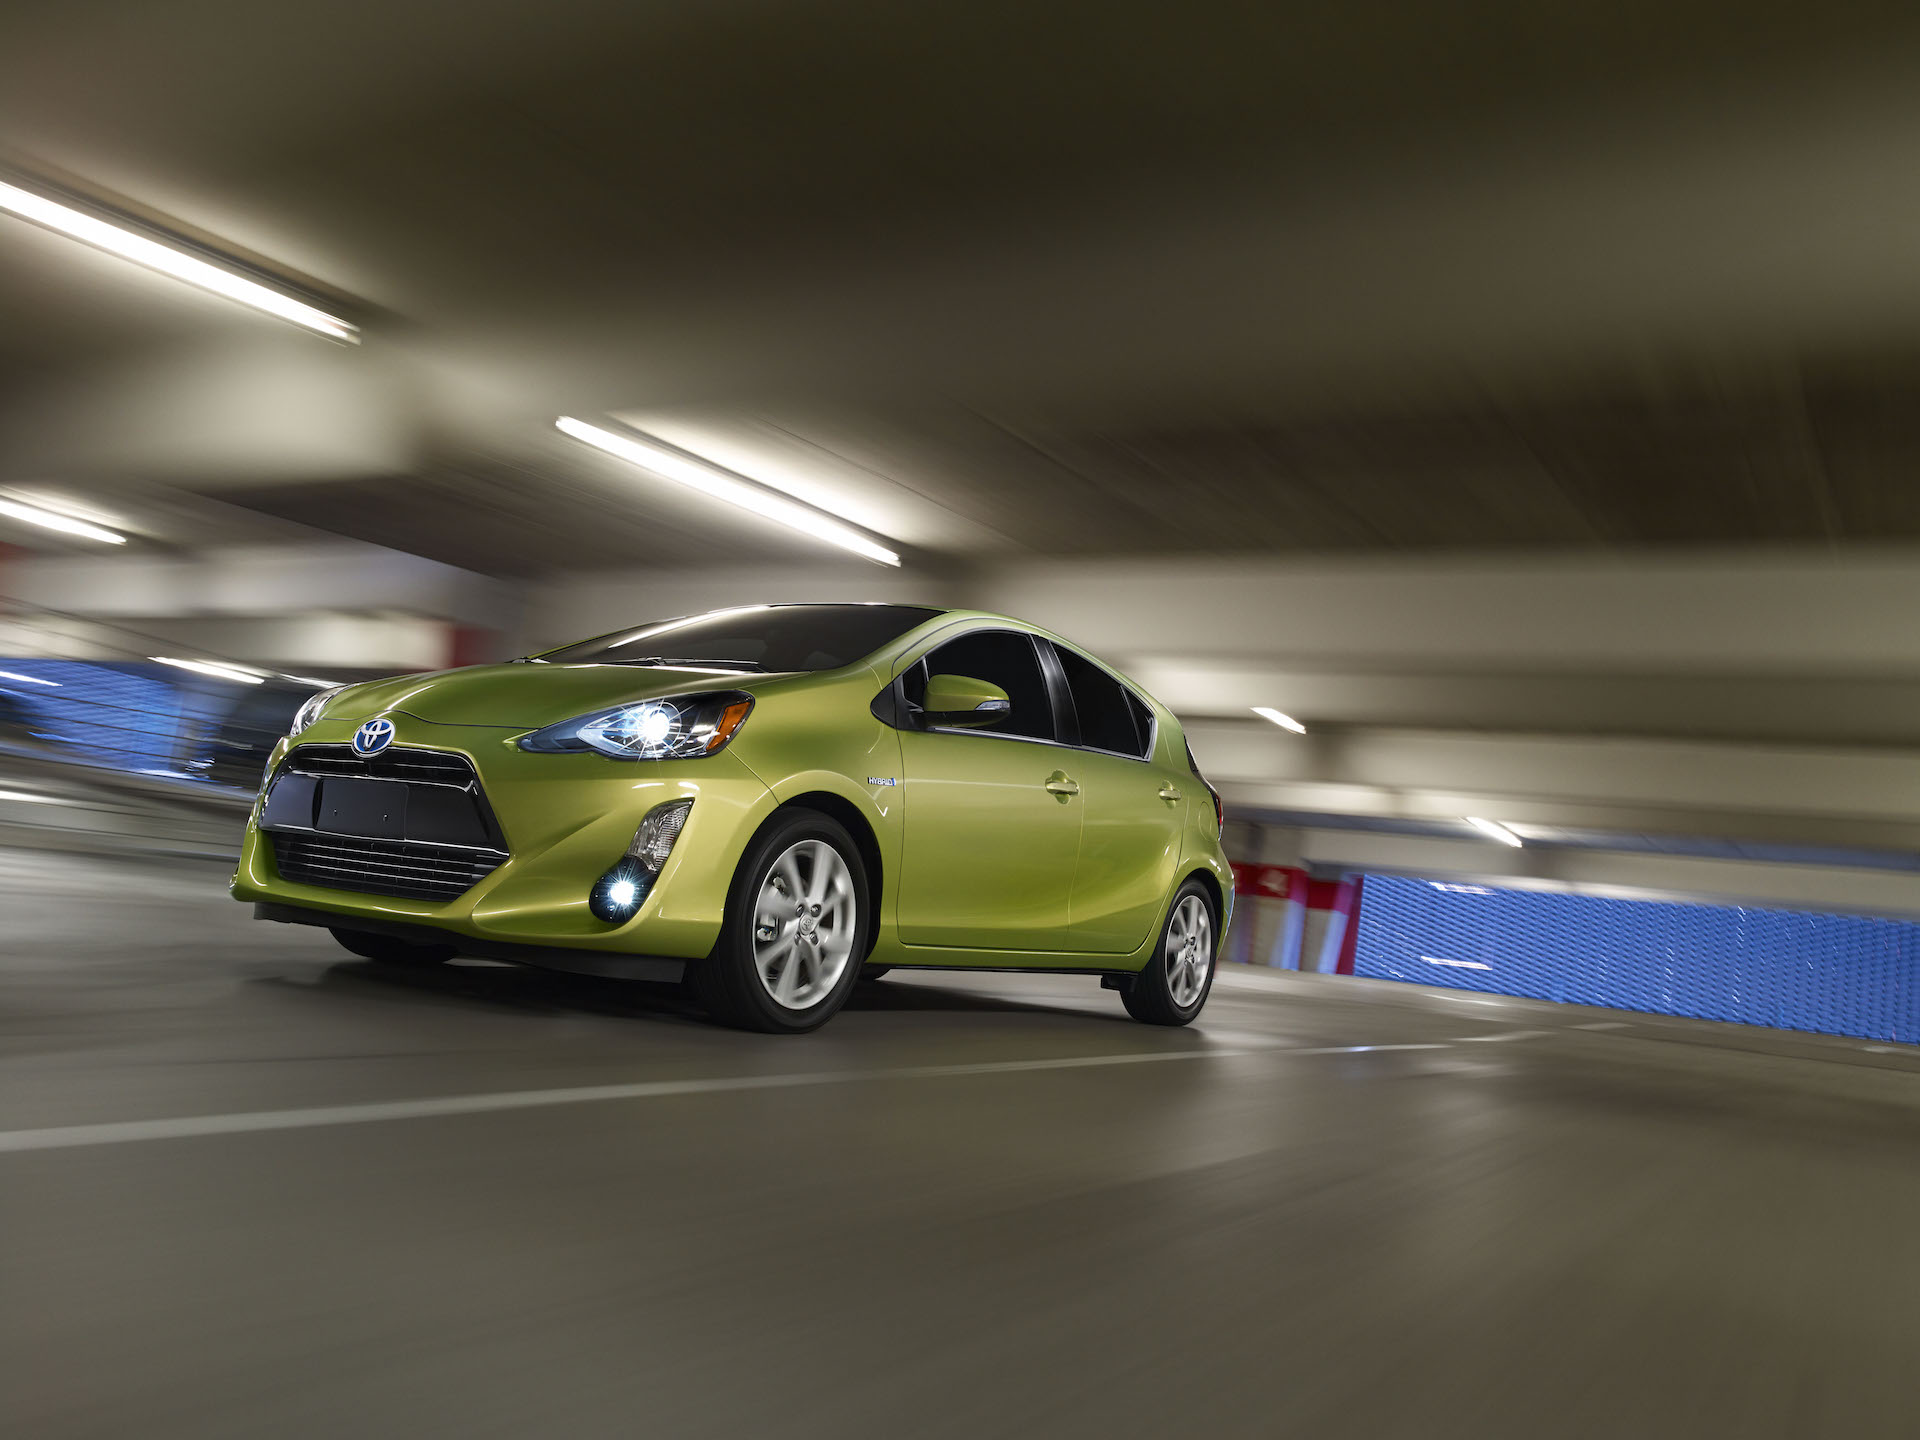 australia s becomes prius tech c caradvice i priusc car affordable toy australias hybrid most toyota